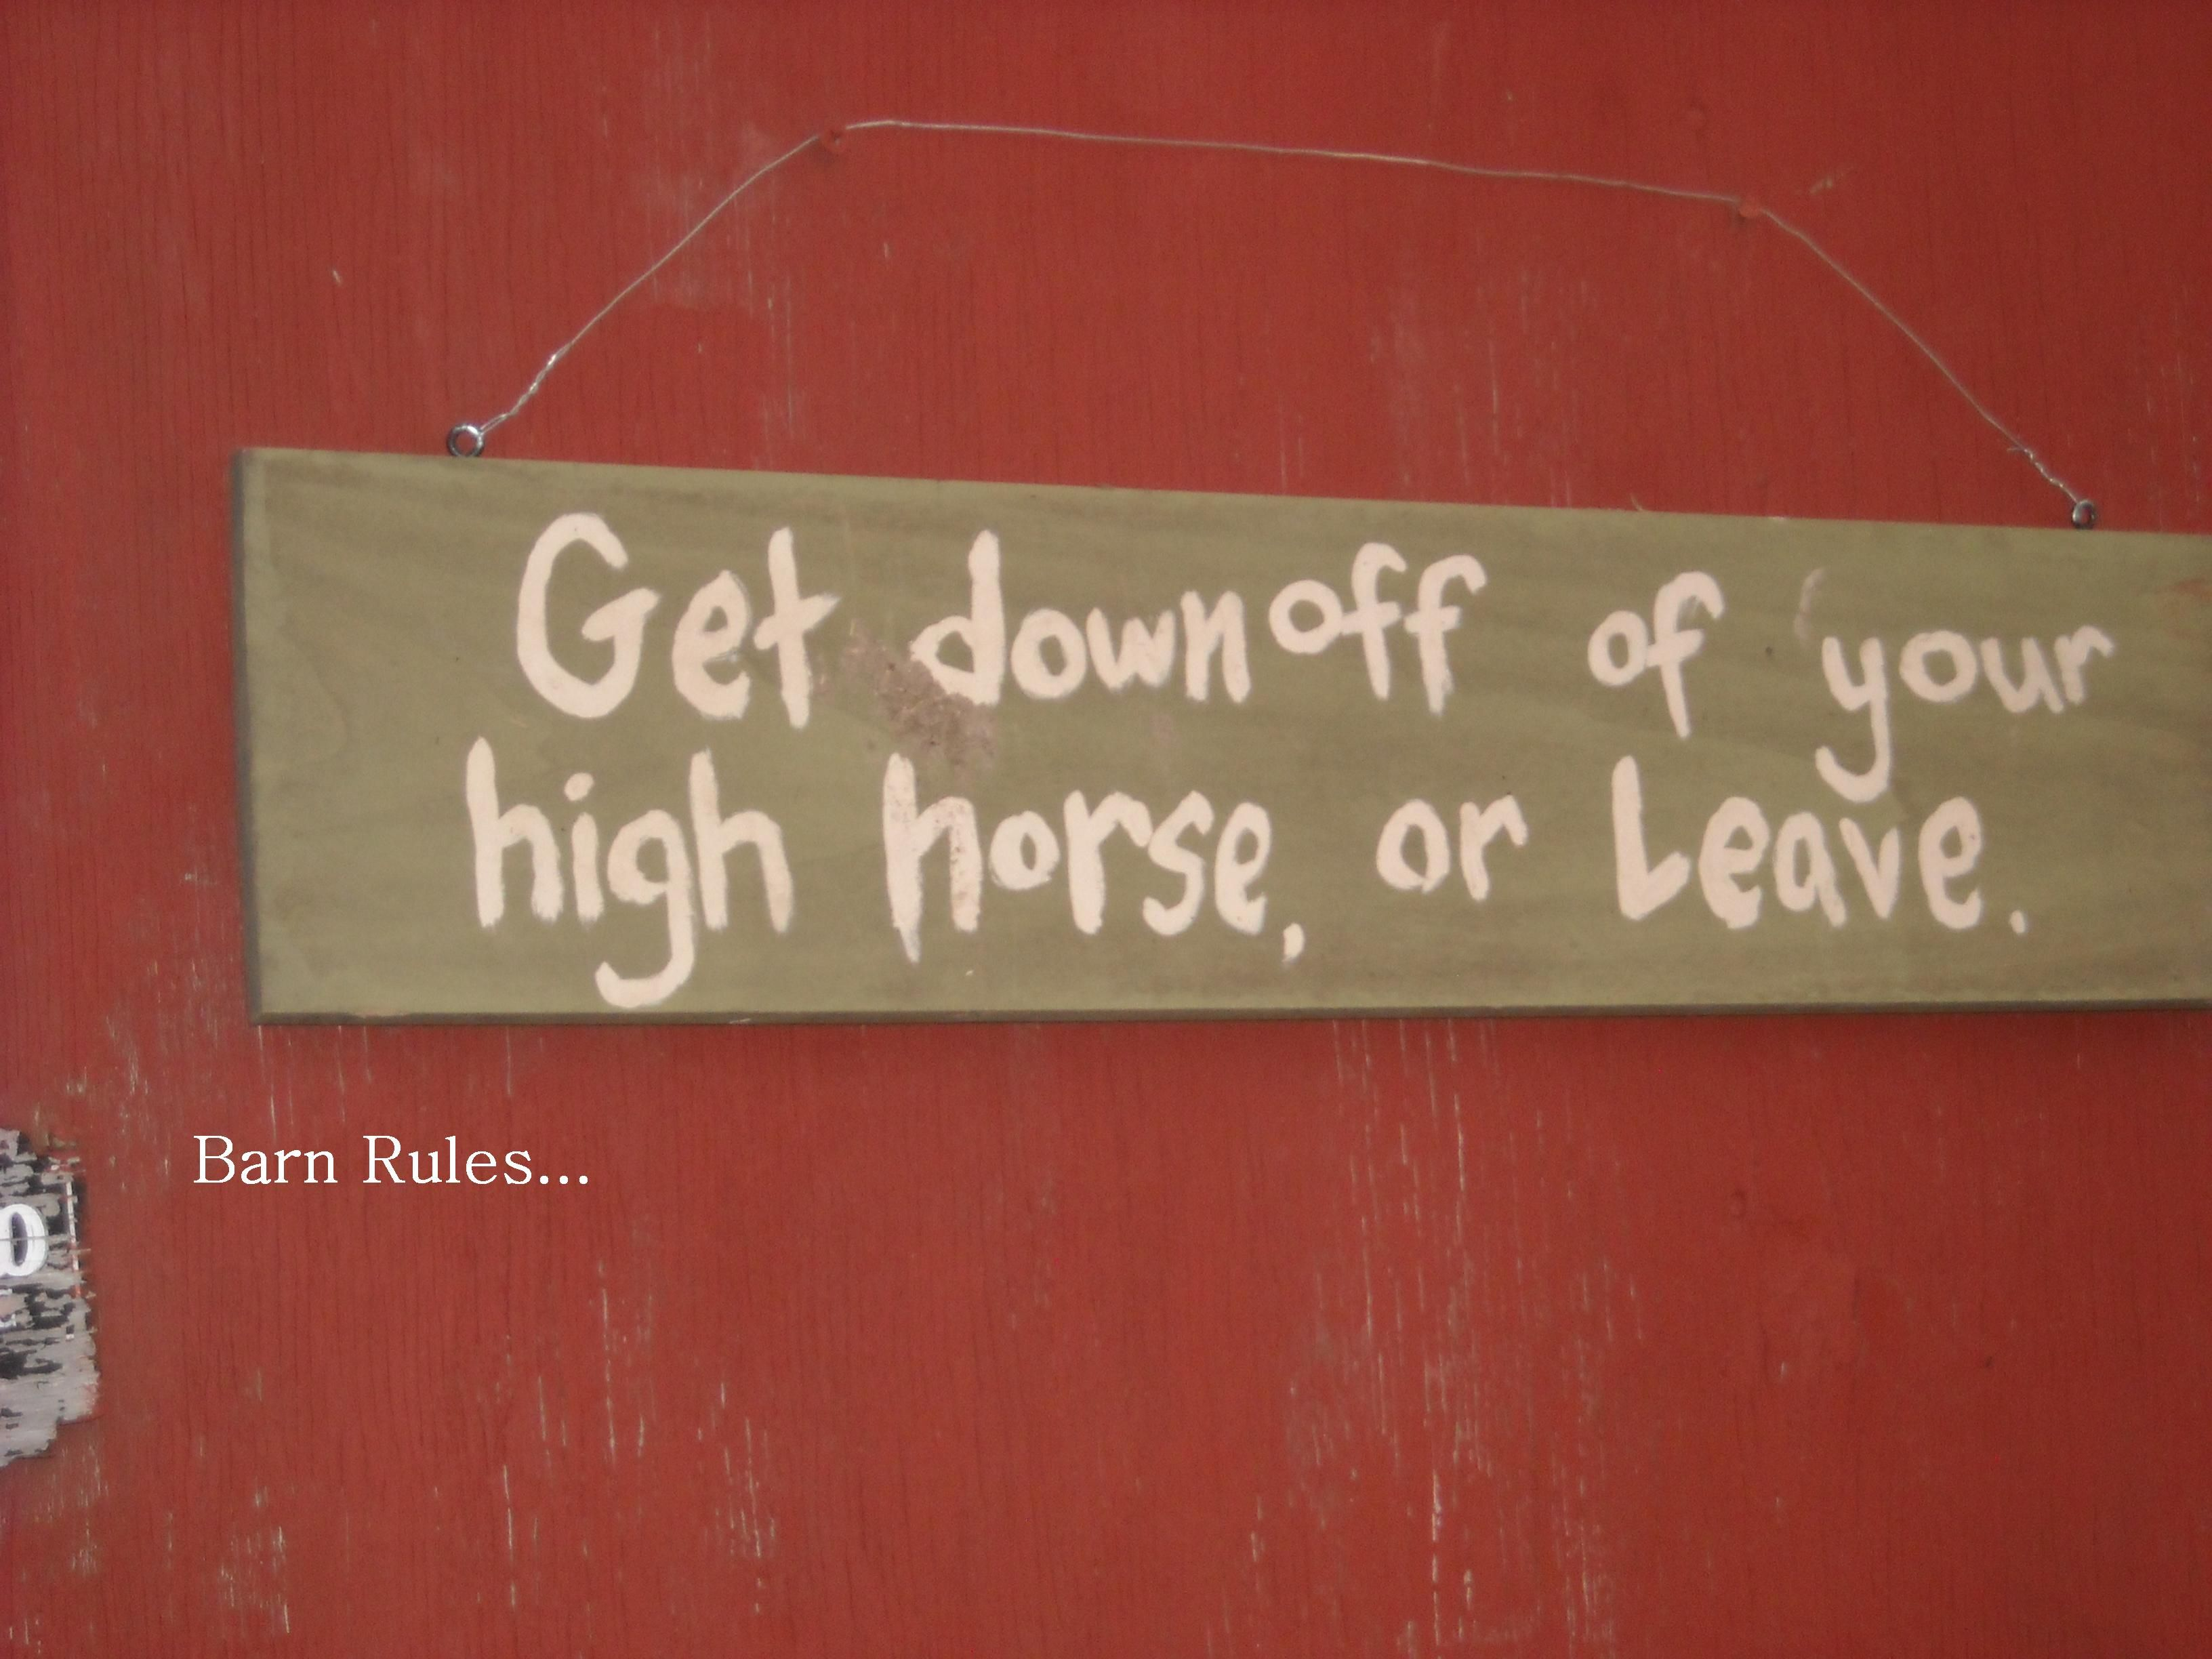 Barn Rules...